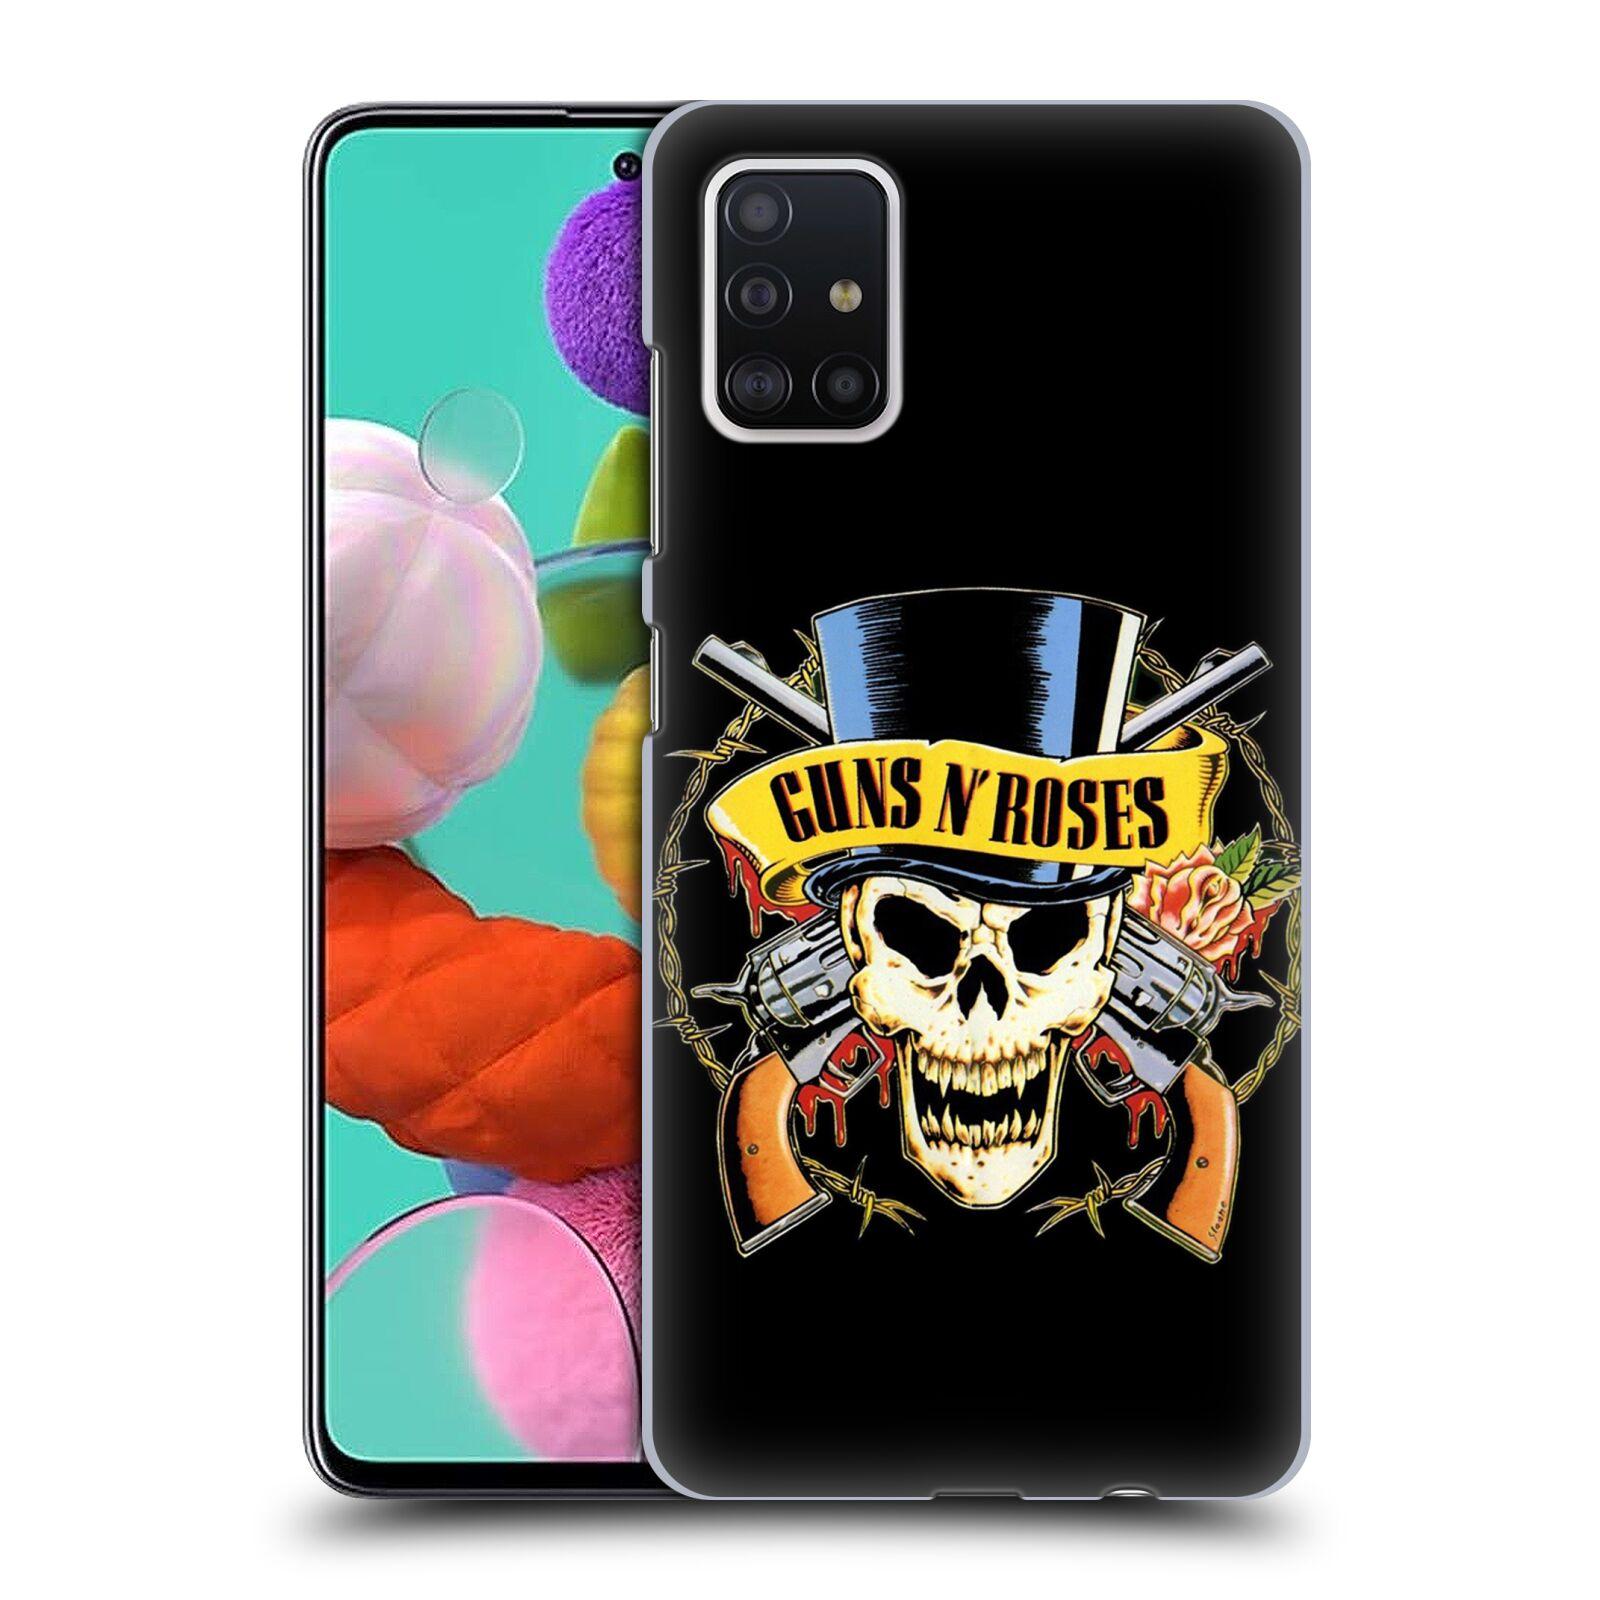 Plastové pouzdro na mobil Samsung Galaxy A51 - Head Case - Guns N' Roses - Lebka